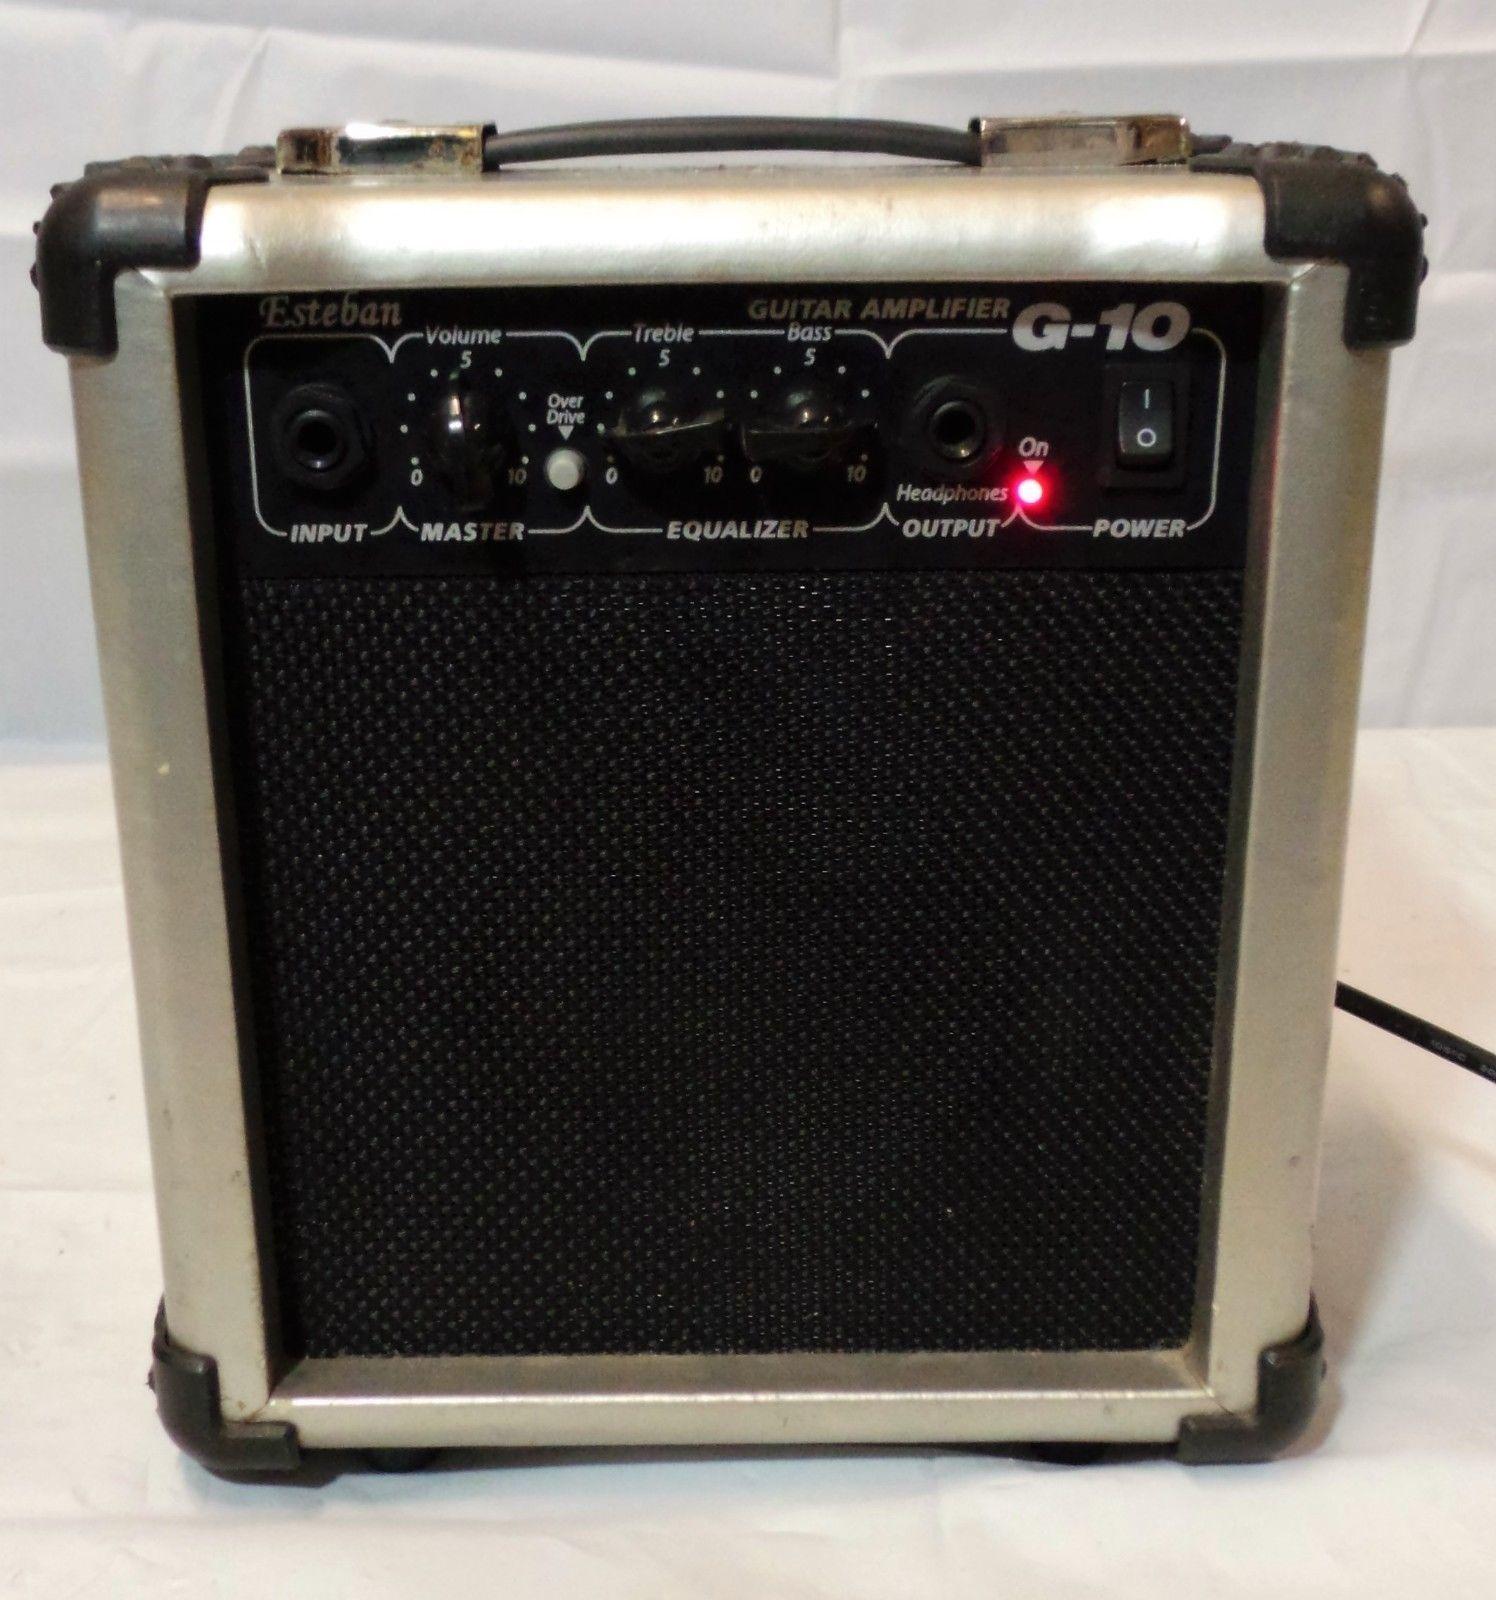 hight resolution of esteban g10 12 watt guitar amp amplifier electric acoustic music portable mobile please retweet